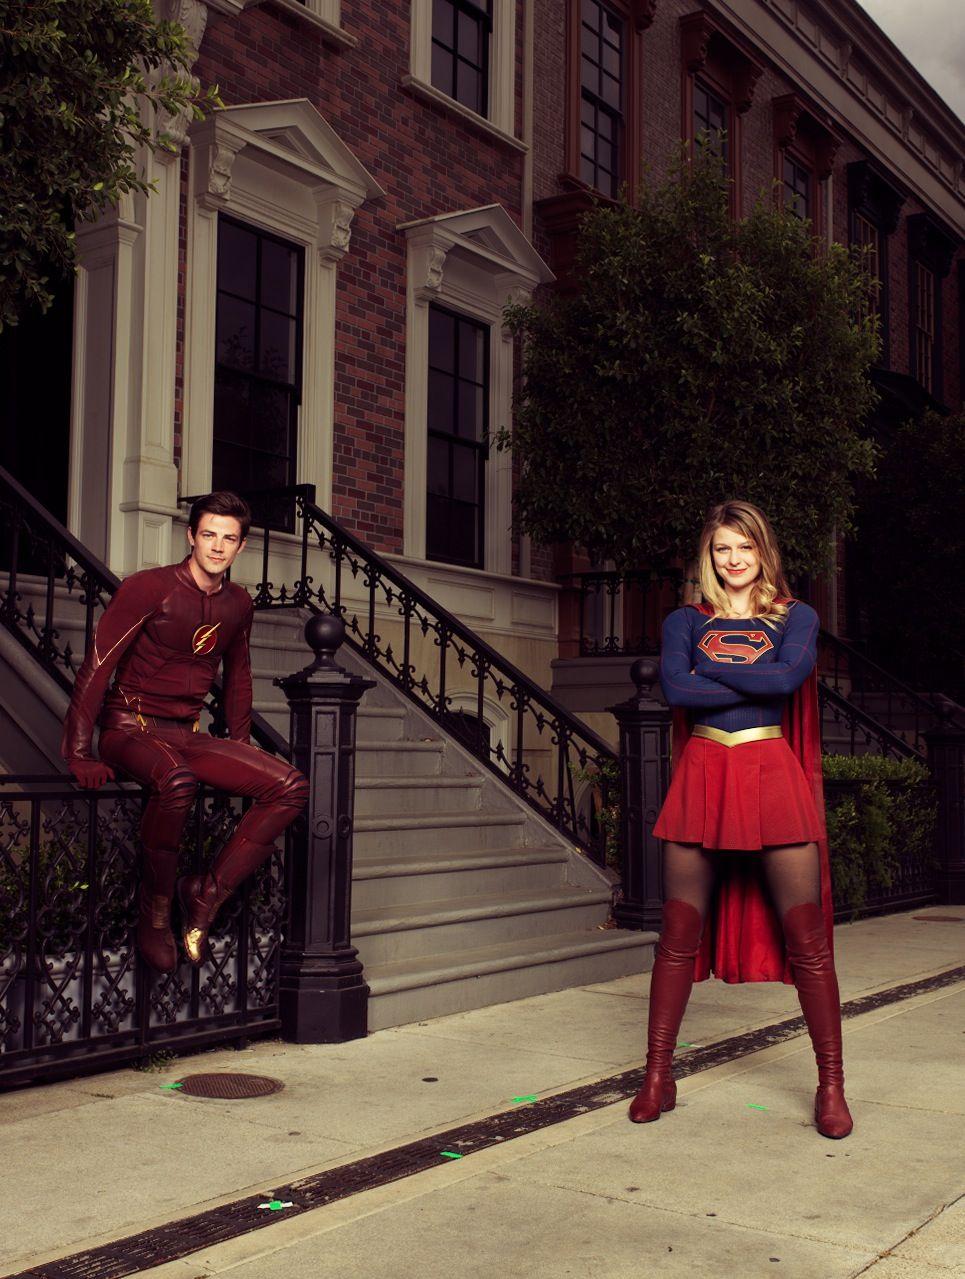 Grant Gustin and Melissa Benoist #theflash & #supergirl